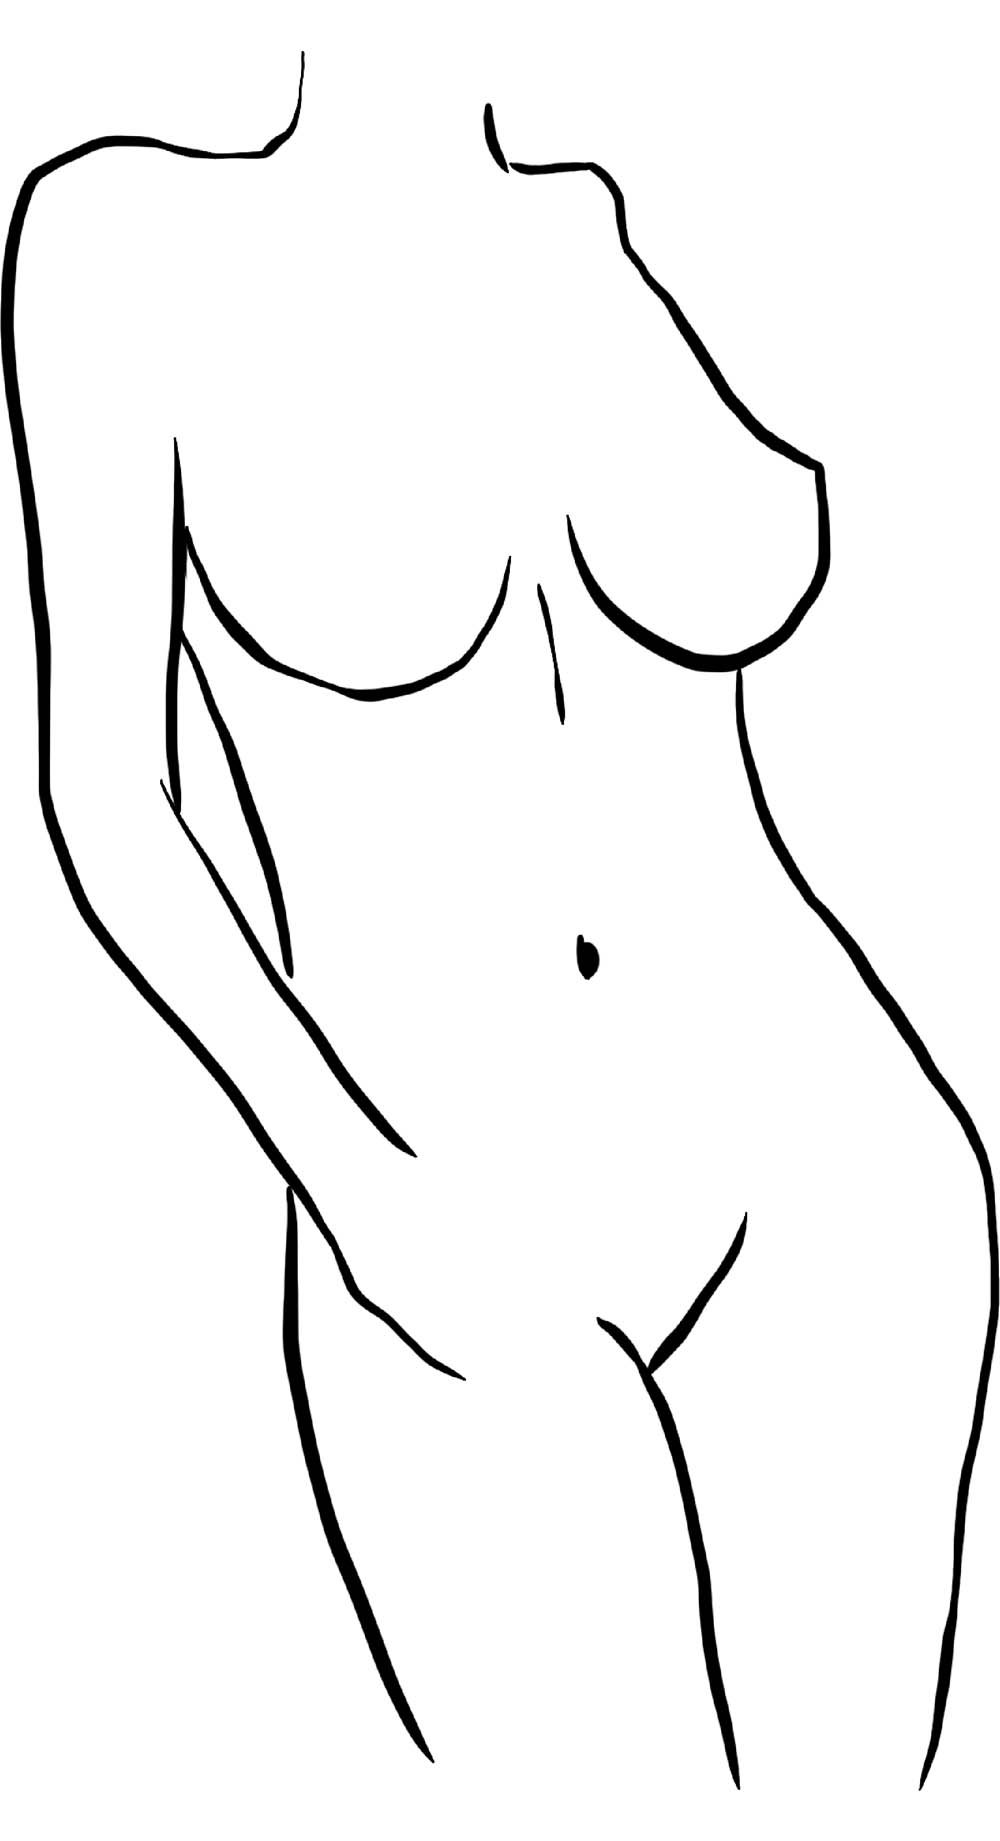 do nipple piercings increase sensitivity